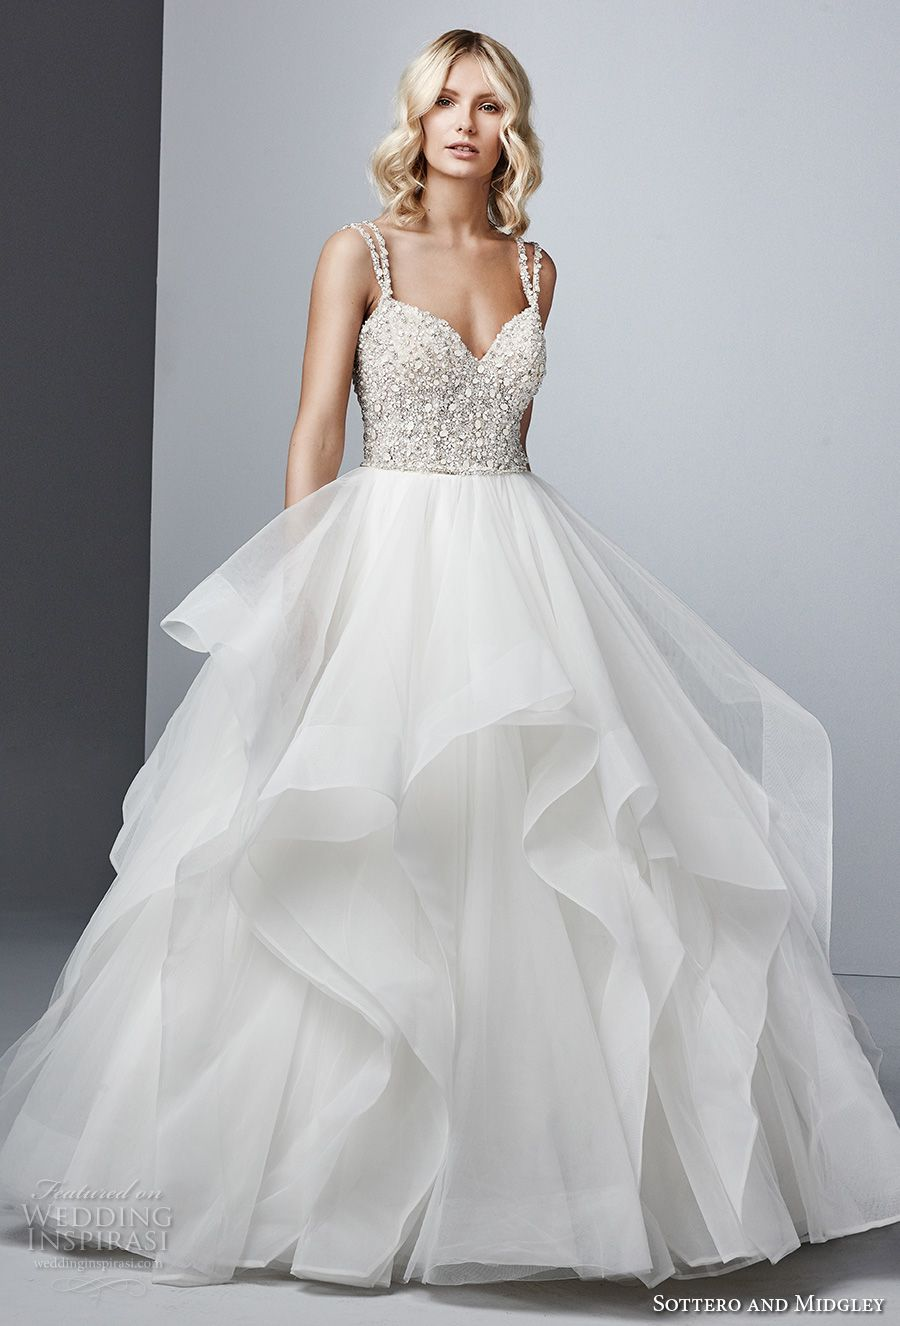 Sottero Midgley Fall 2017 Double Strap Sweetheart Neckline Heavily Embellished Beaded Bodice Layered Skirt Princess Glamorous Ball Gown Wedding Dress Open